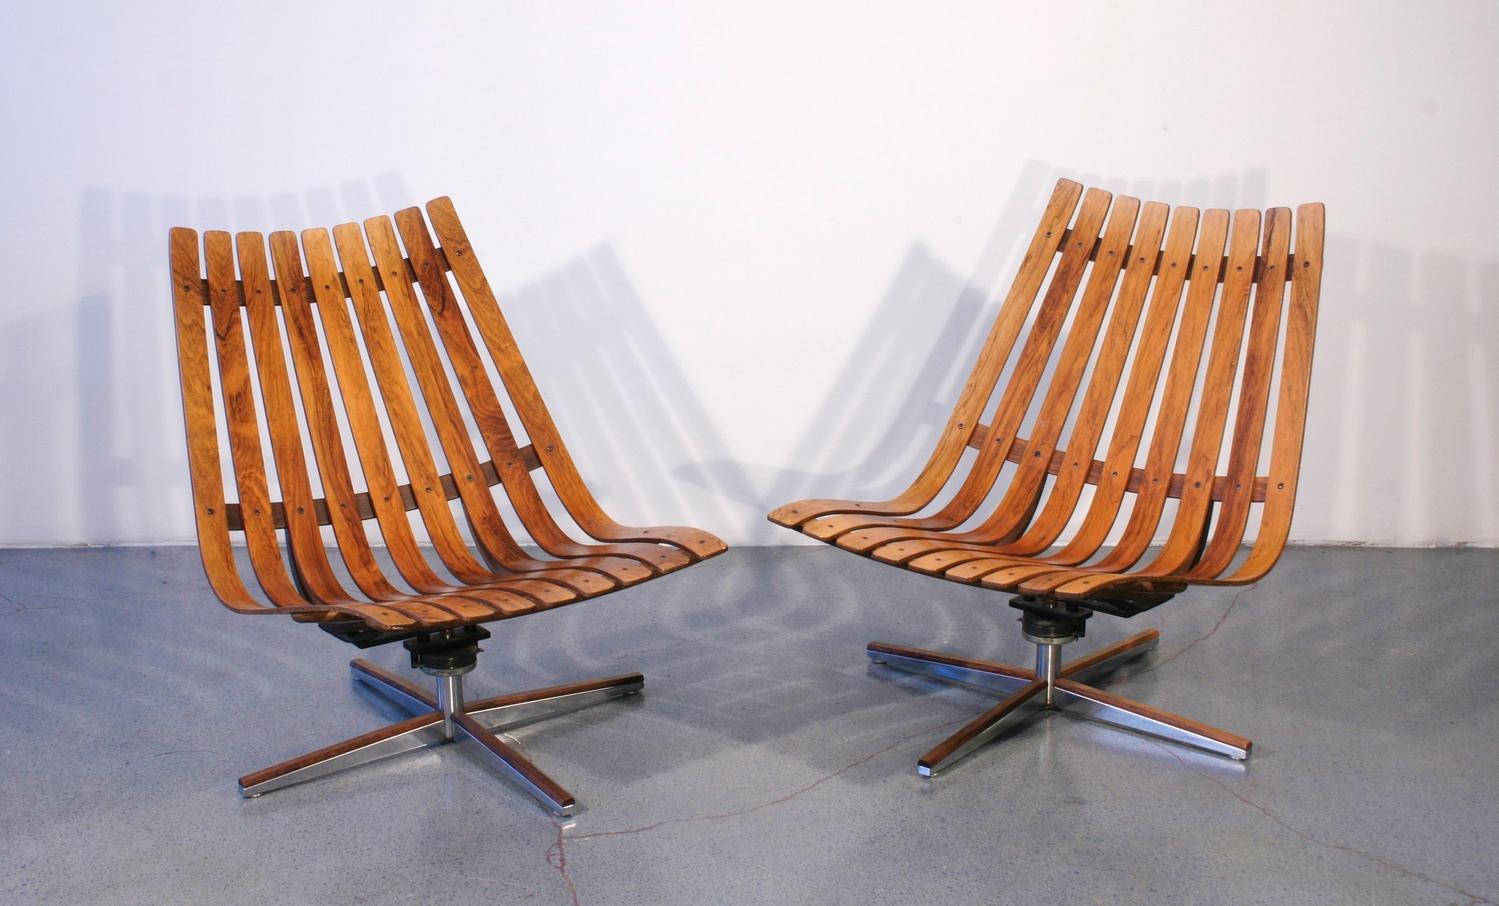 Enjoyable Mid Century Modern Swivel Slat Chairs Norway C 1950 Inzonedesignstudio Interior Chair Design Inzonedesignstudiocom